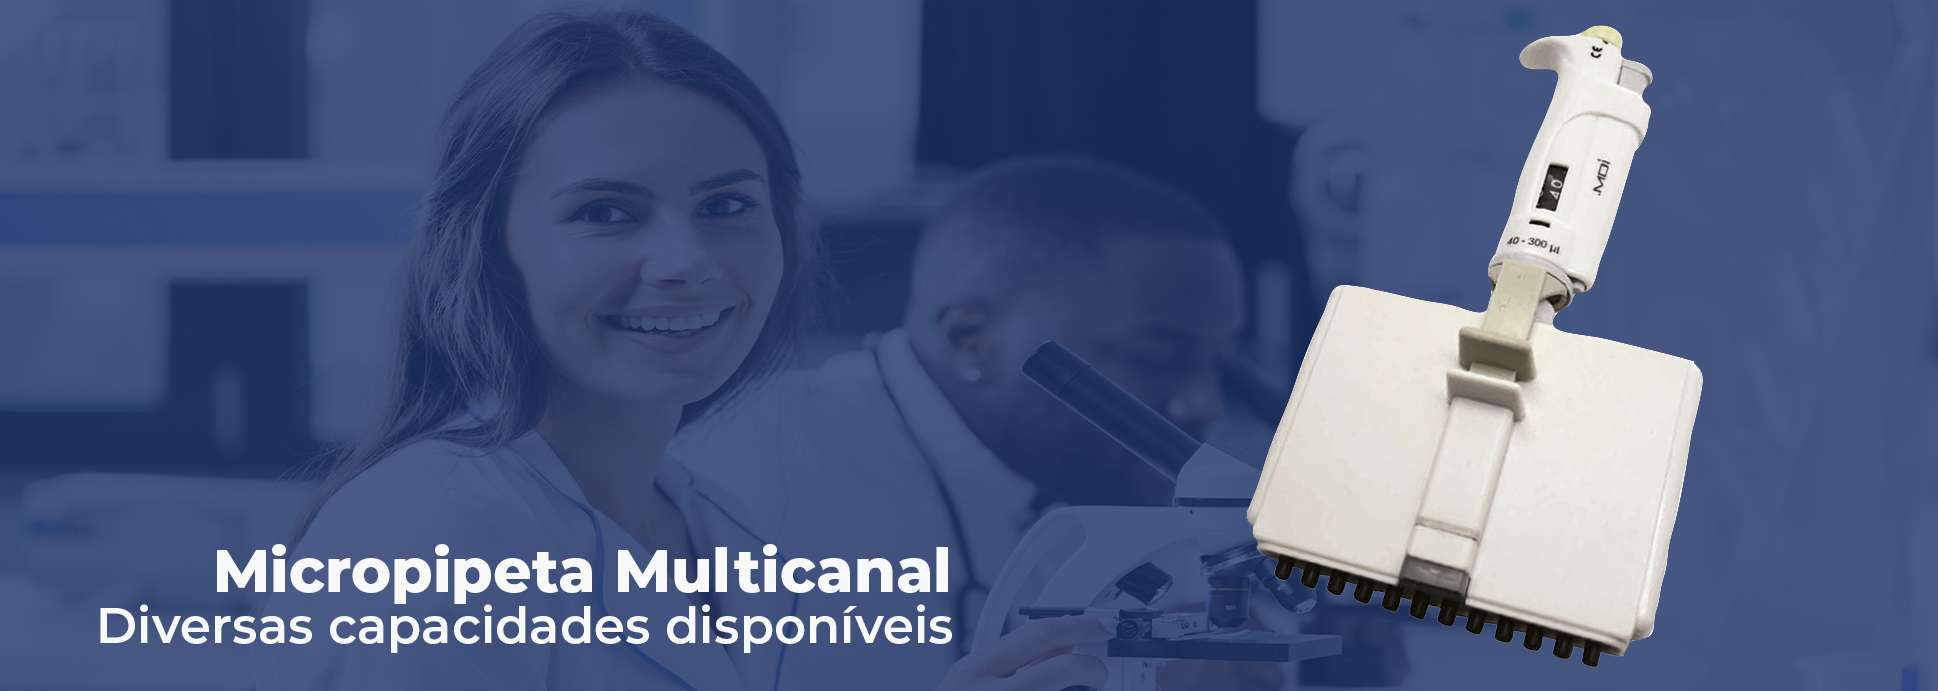 MODELO PRODUTOS EM DESTAQUE - micropipeta